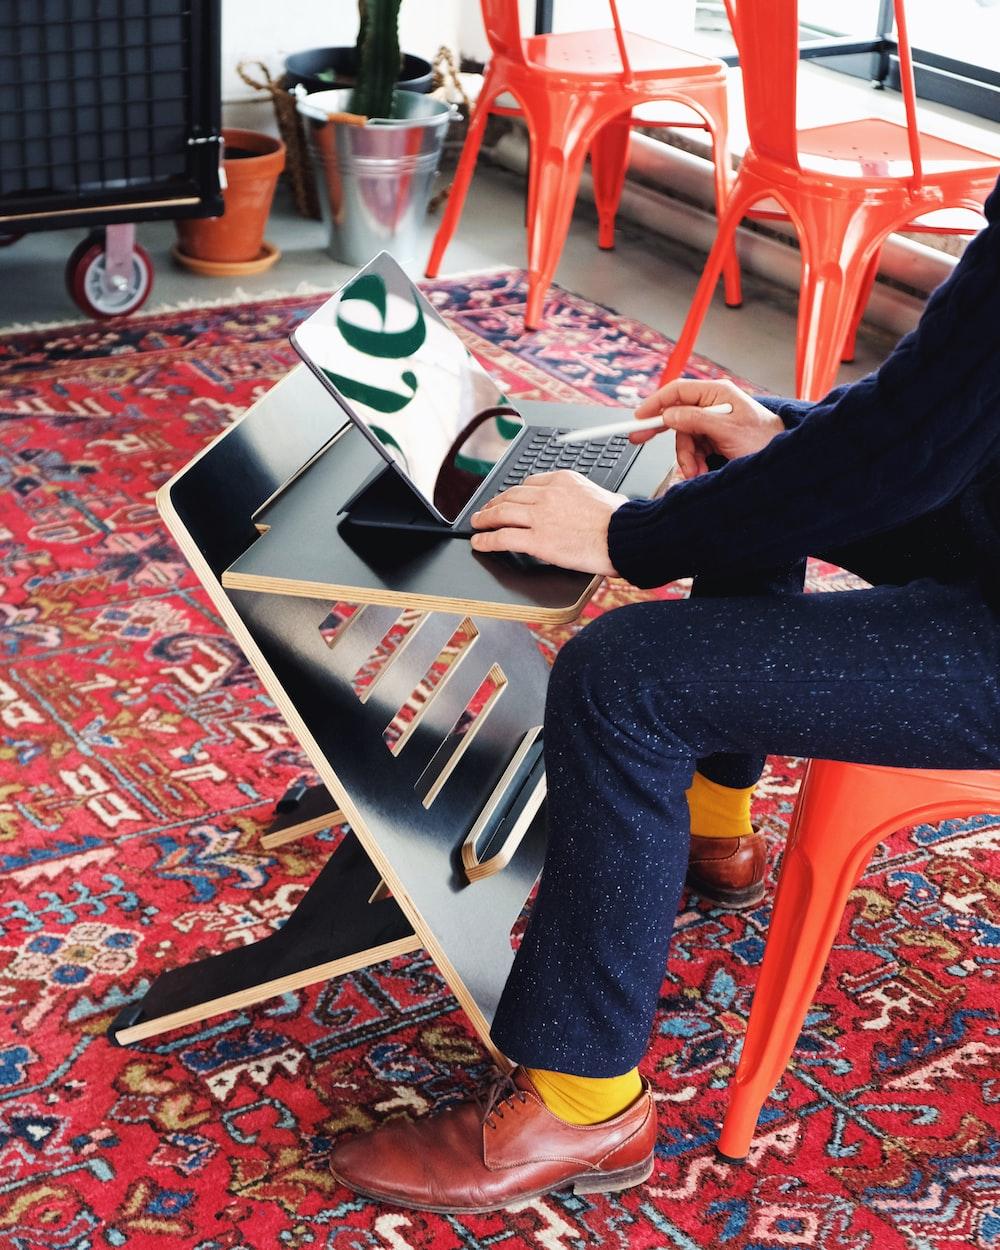 person in black pants sitting on orange plastic chair reading magazine